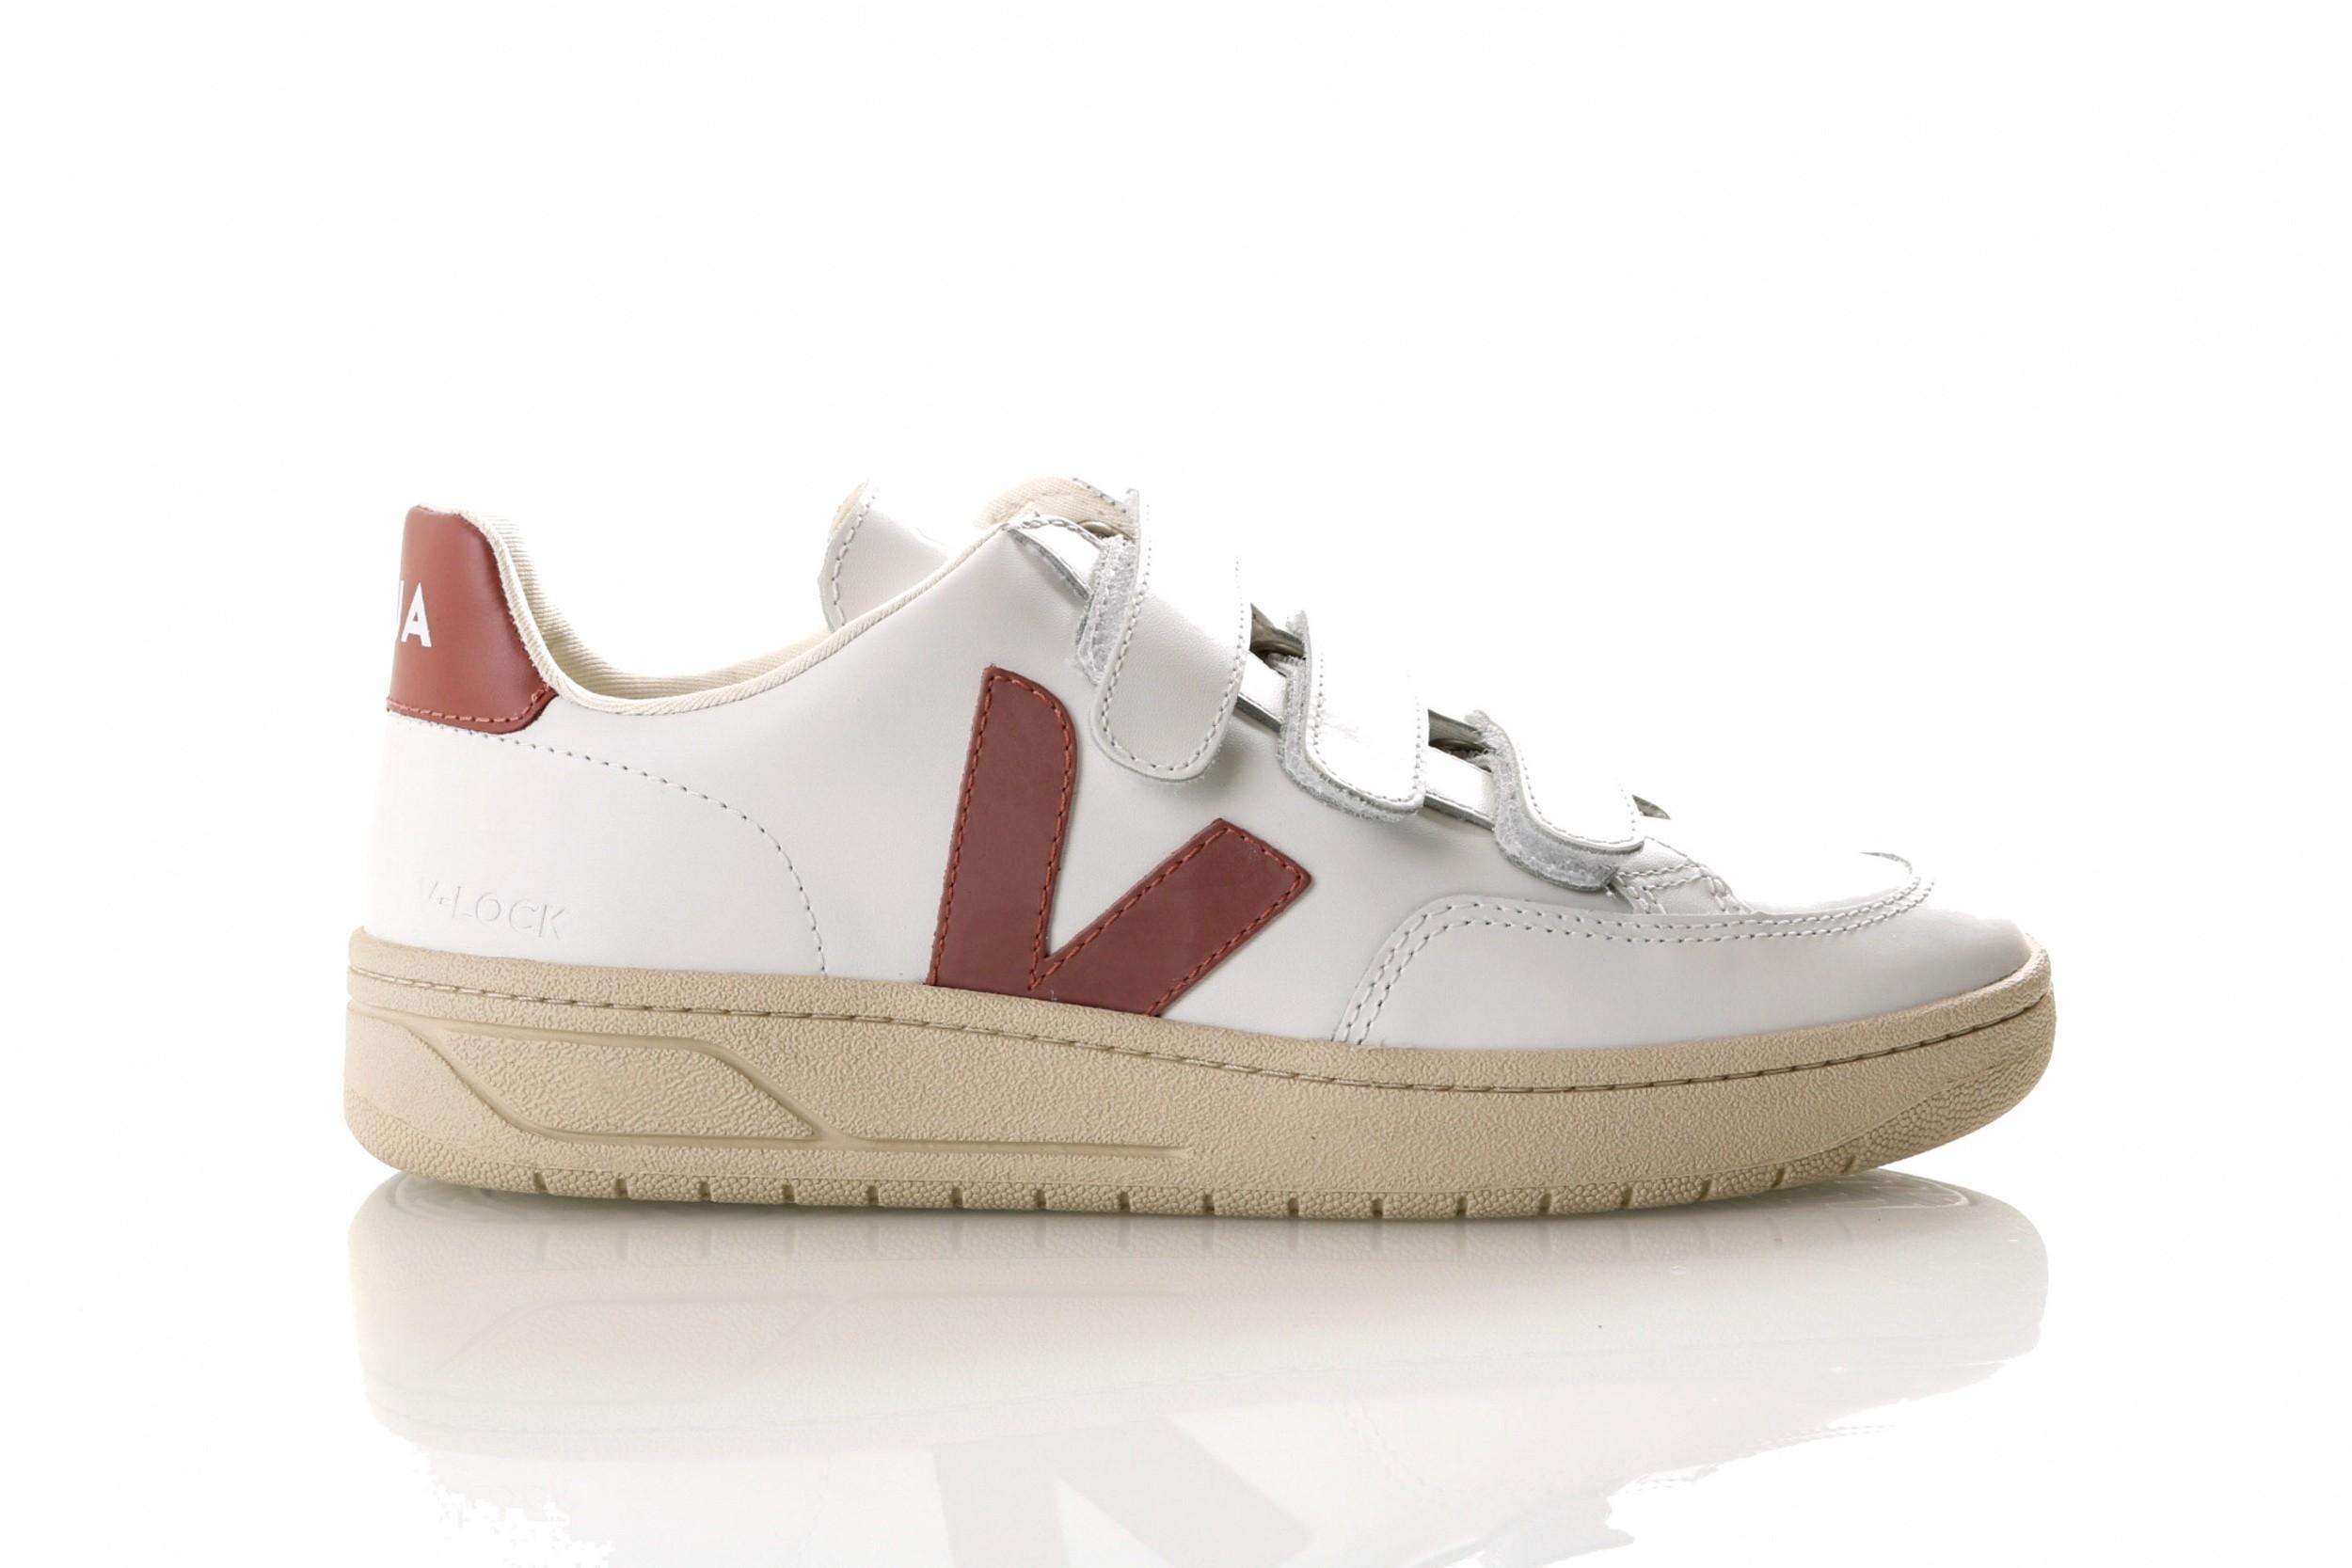 Foto van Veja V-12_Velcro Xc021599 Sneakers Extra White/Dried Petale